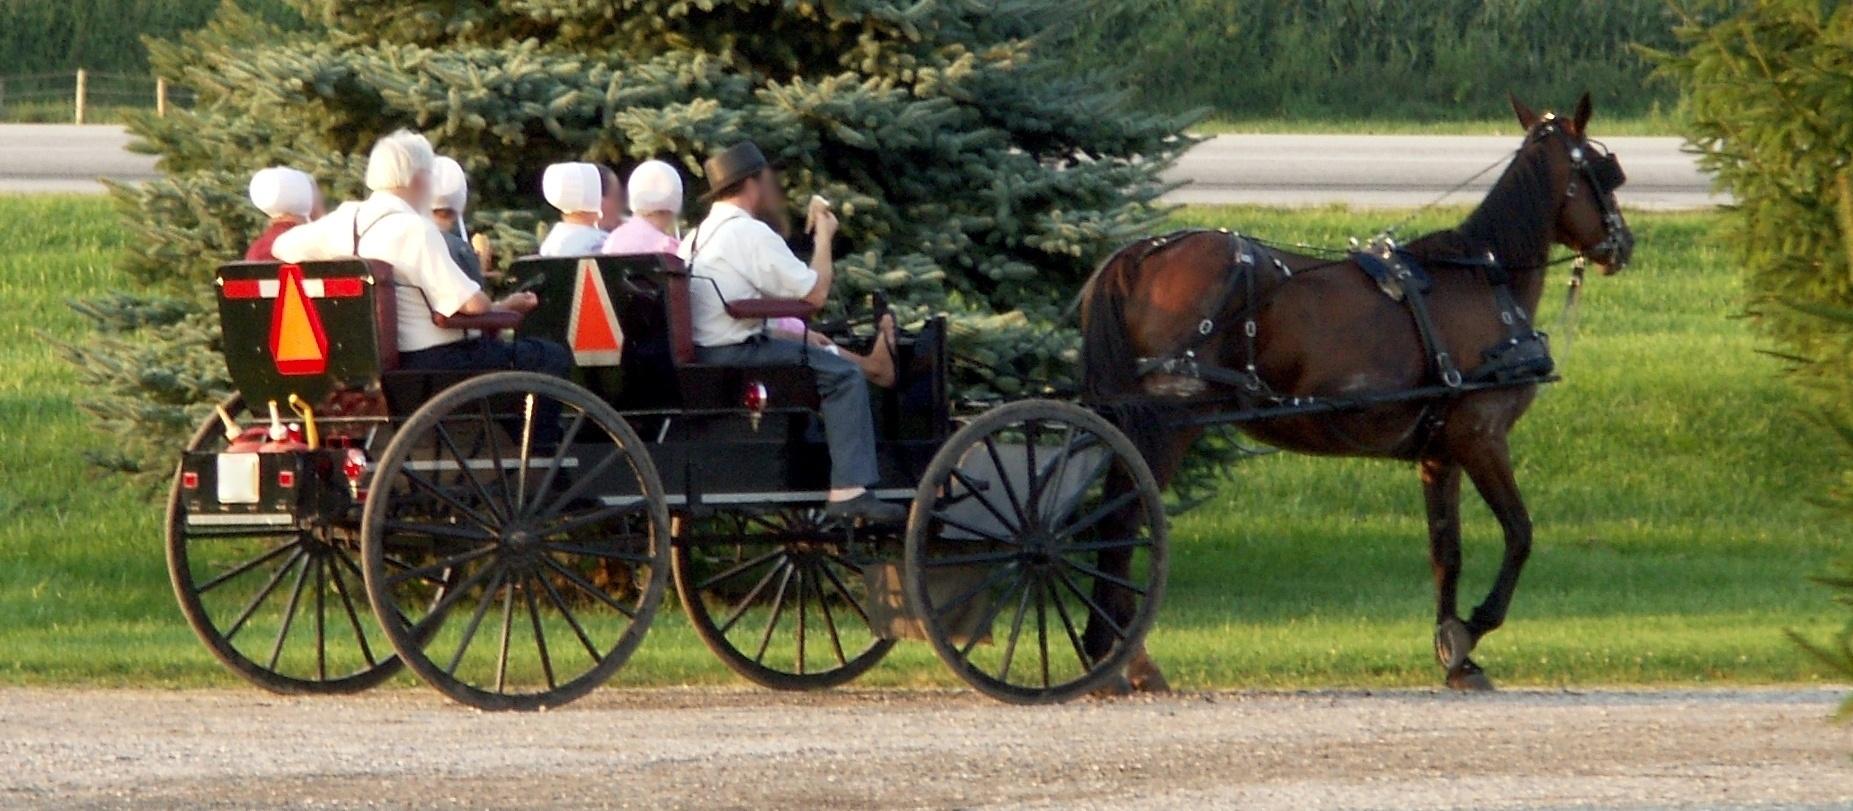 File:Amish people.jpg — Wikimedia Commons